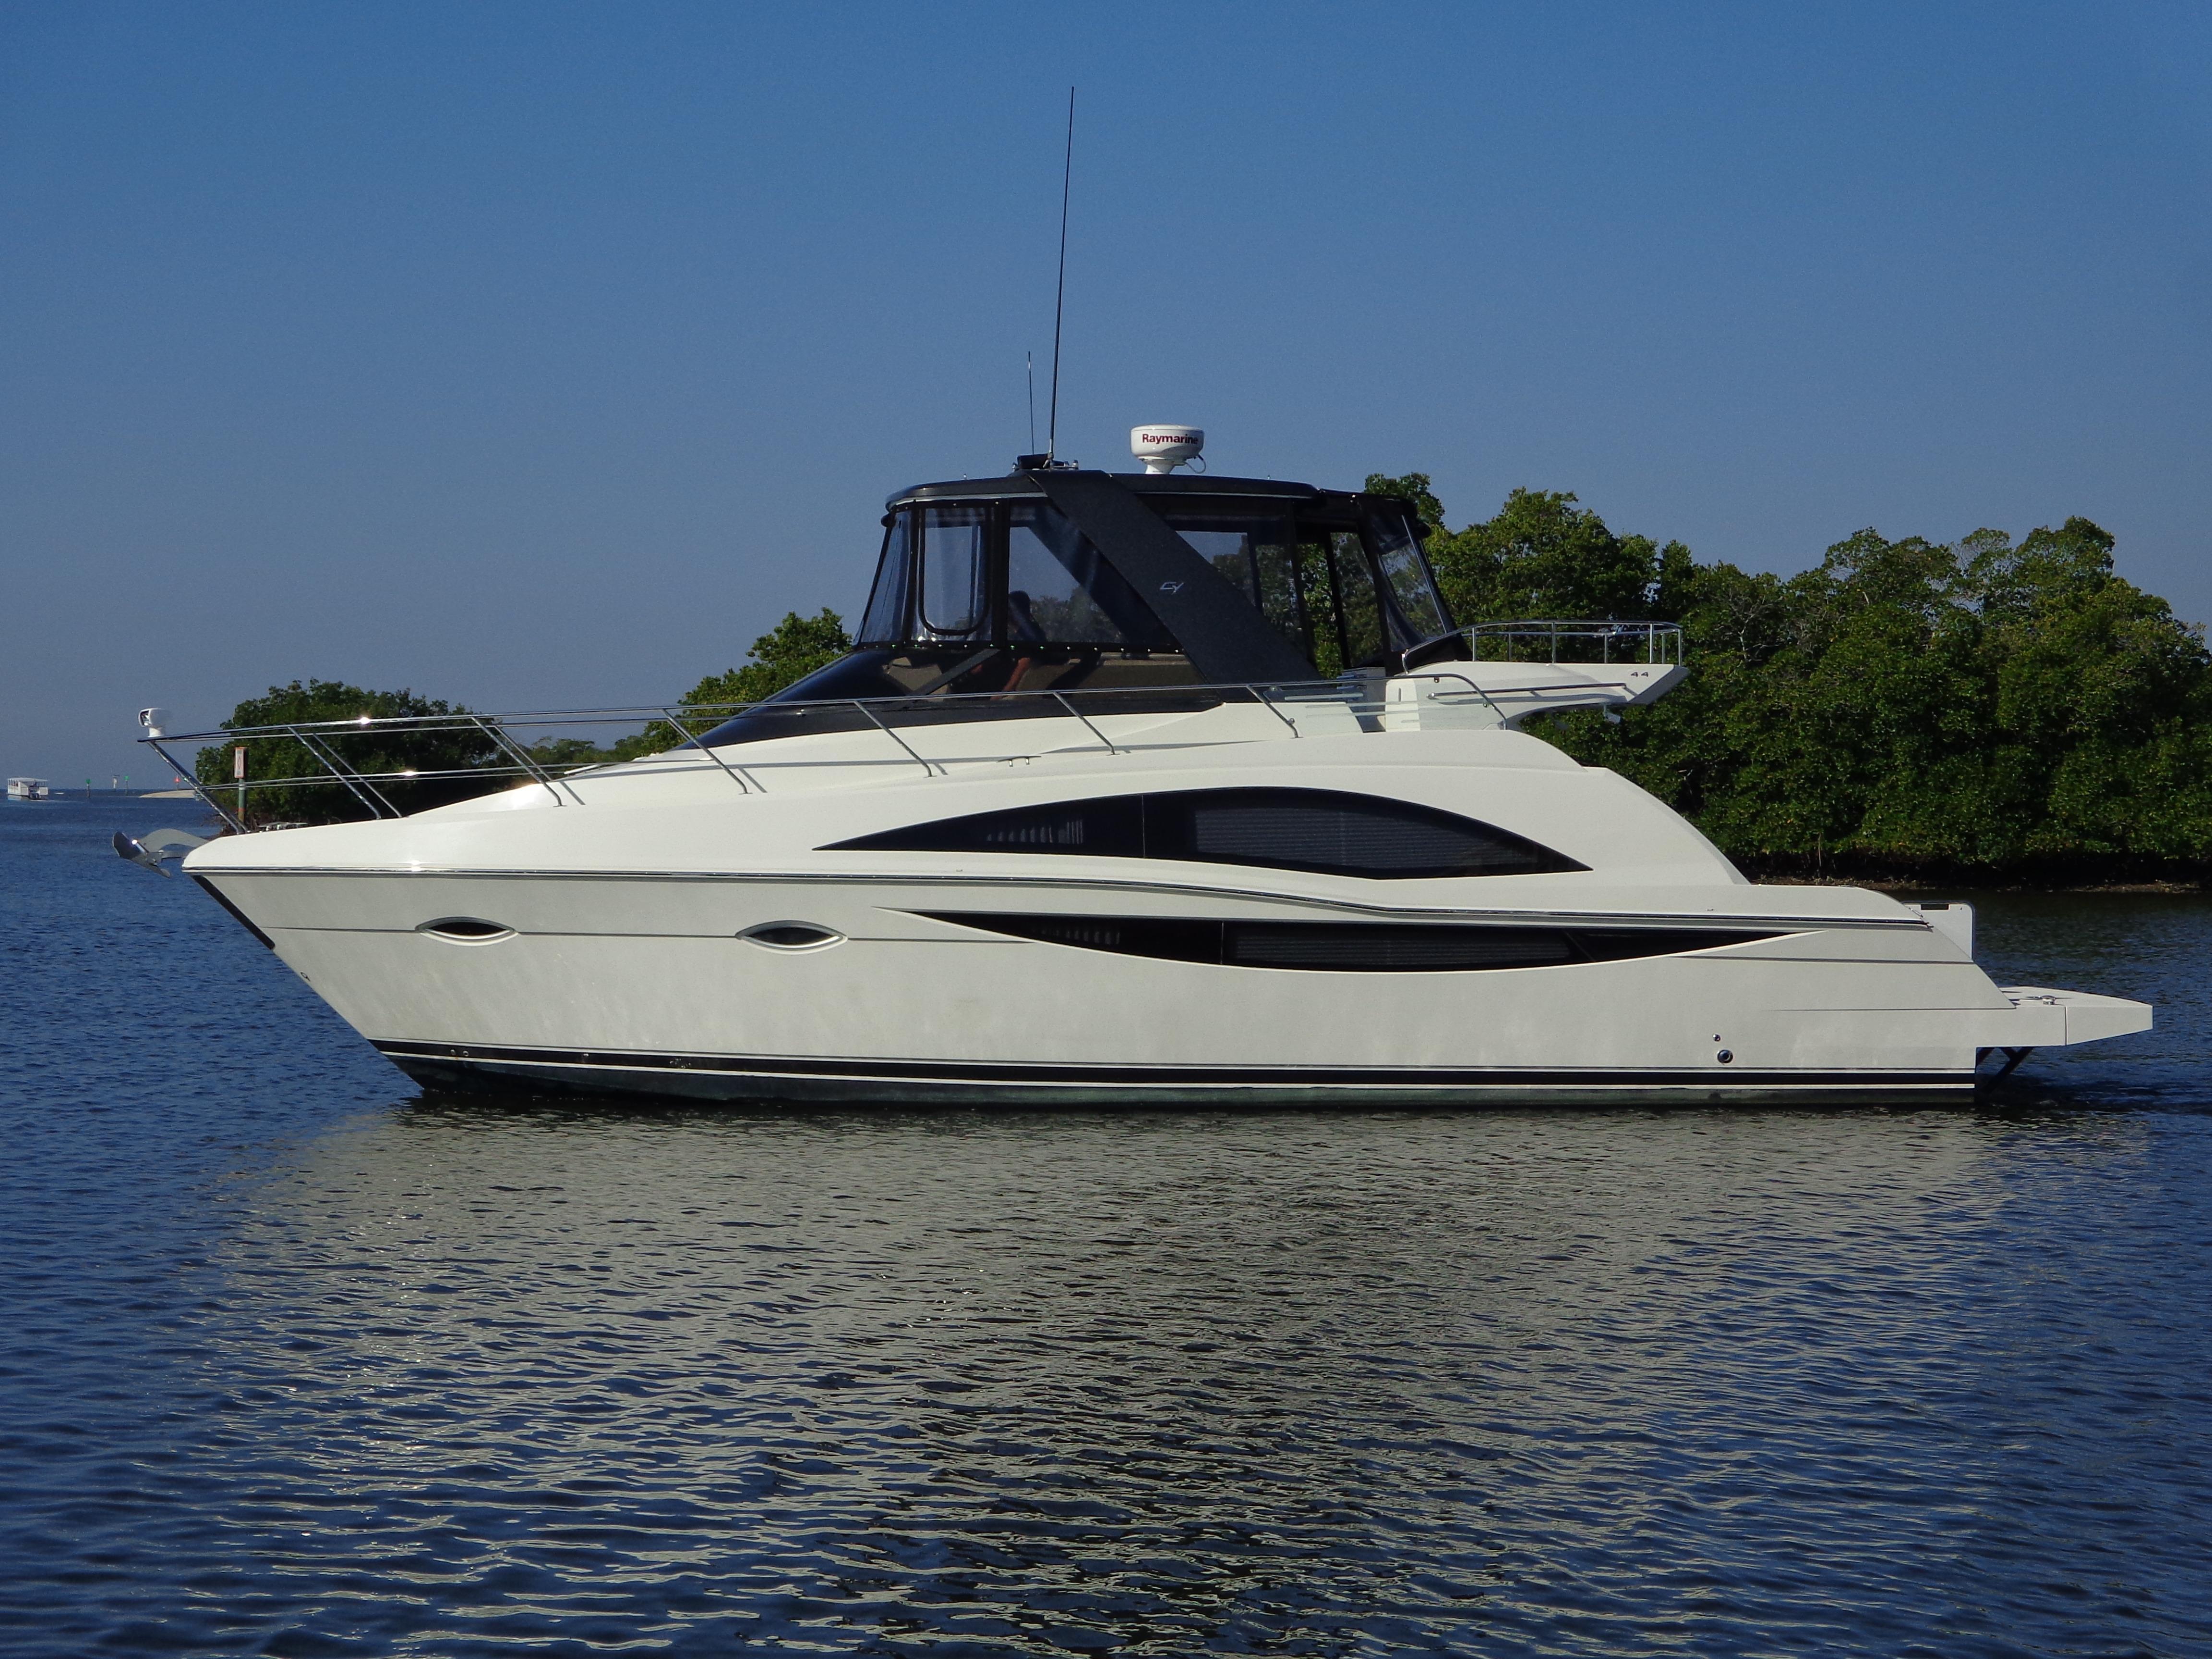 44 CARVER YACHTS 2012 SW Florida | Denison Yacht Sales